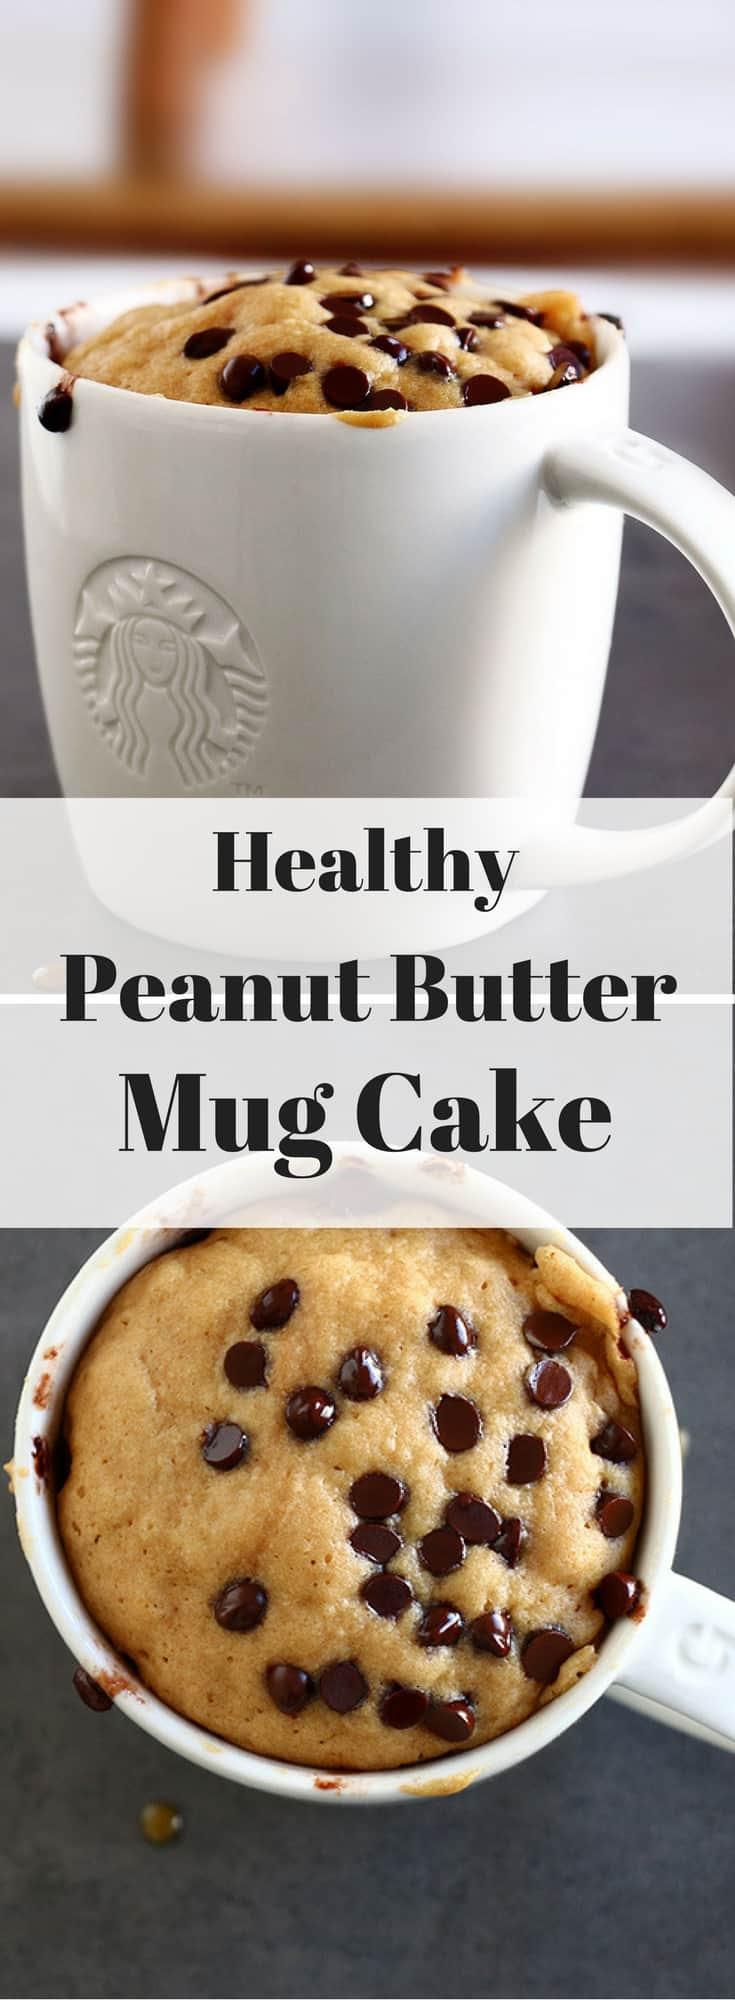 Healthy Peanut Butter Mug Cake - Baking-Ginger